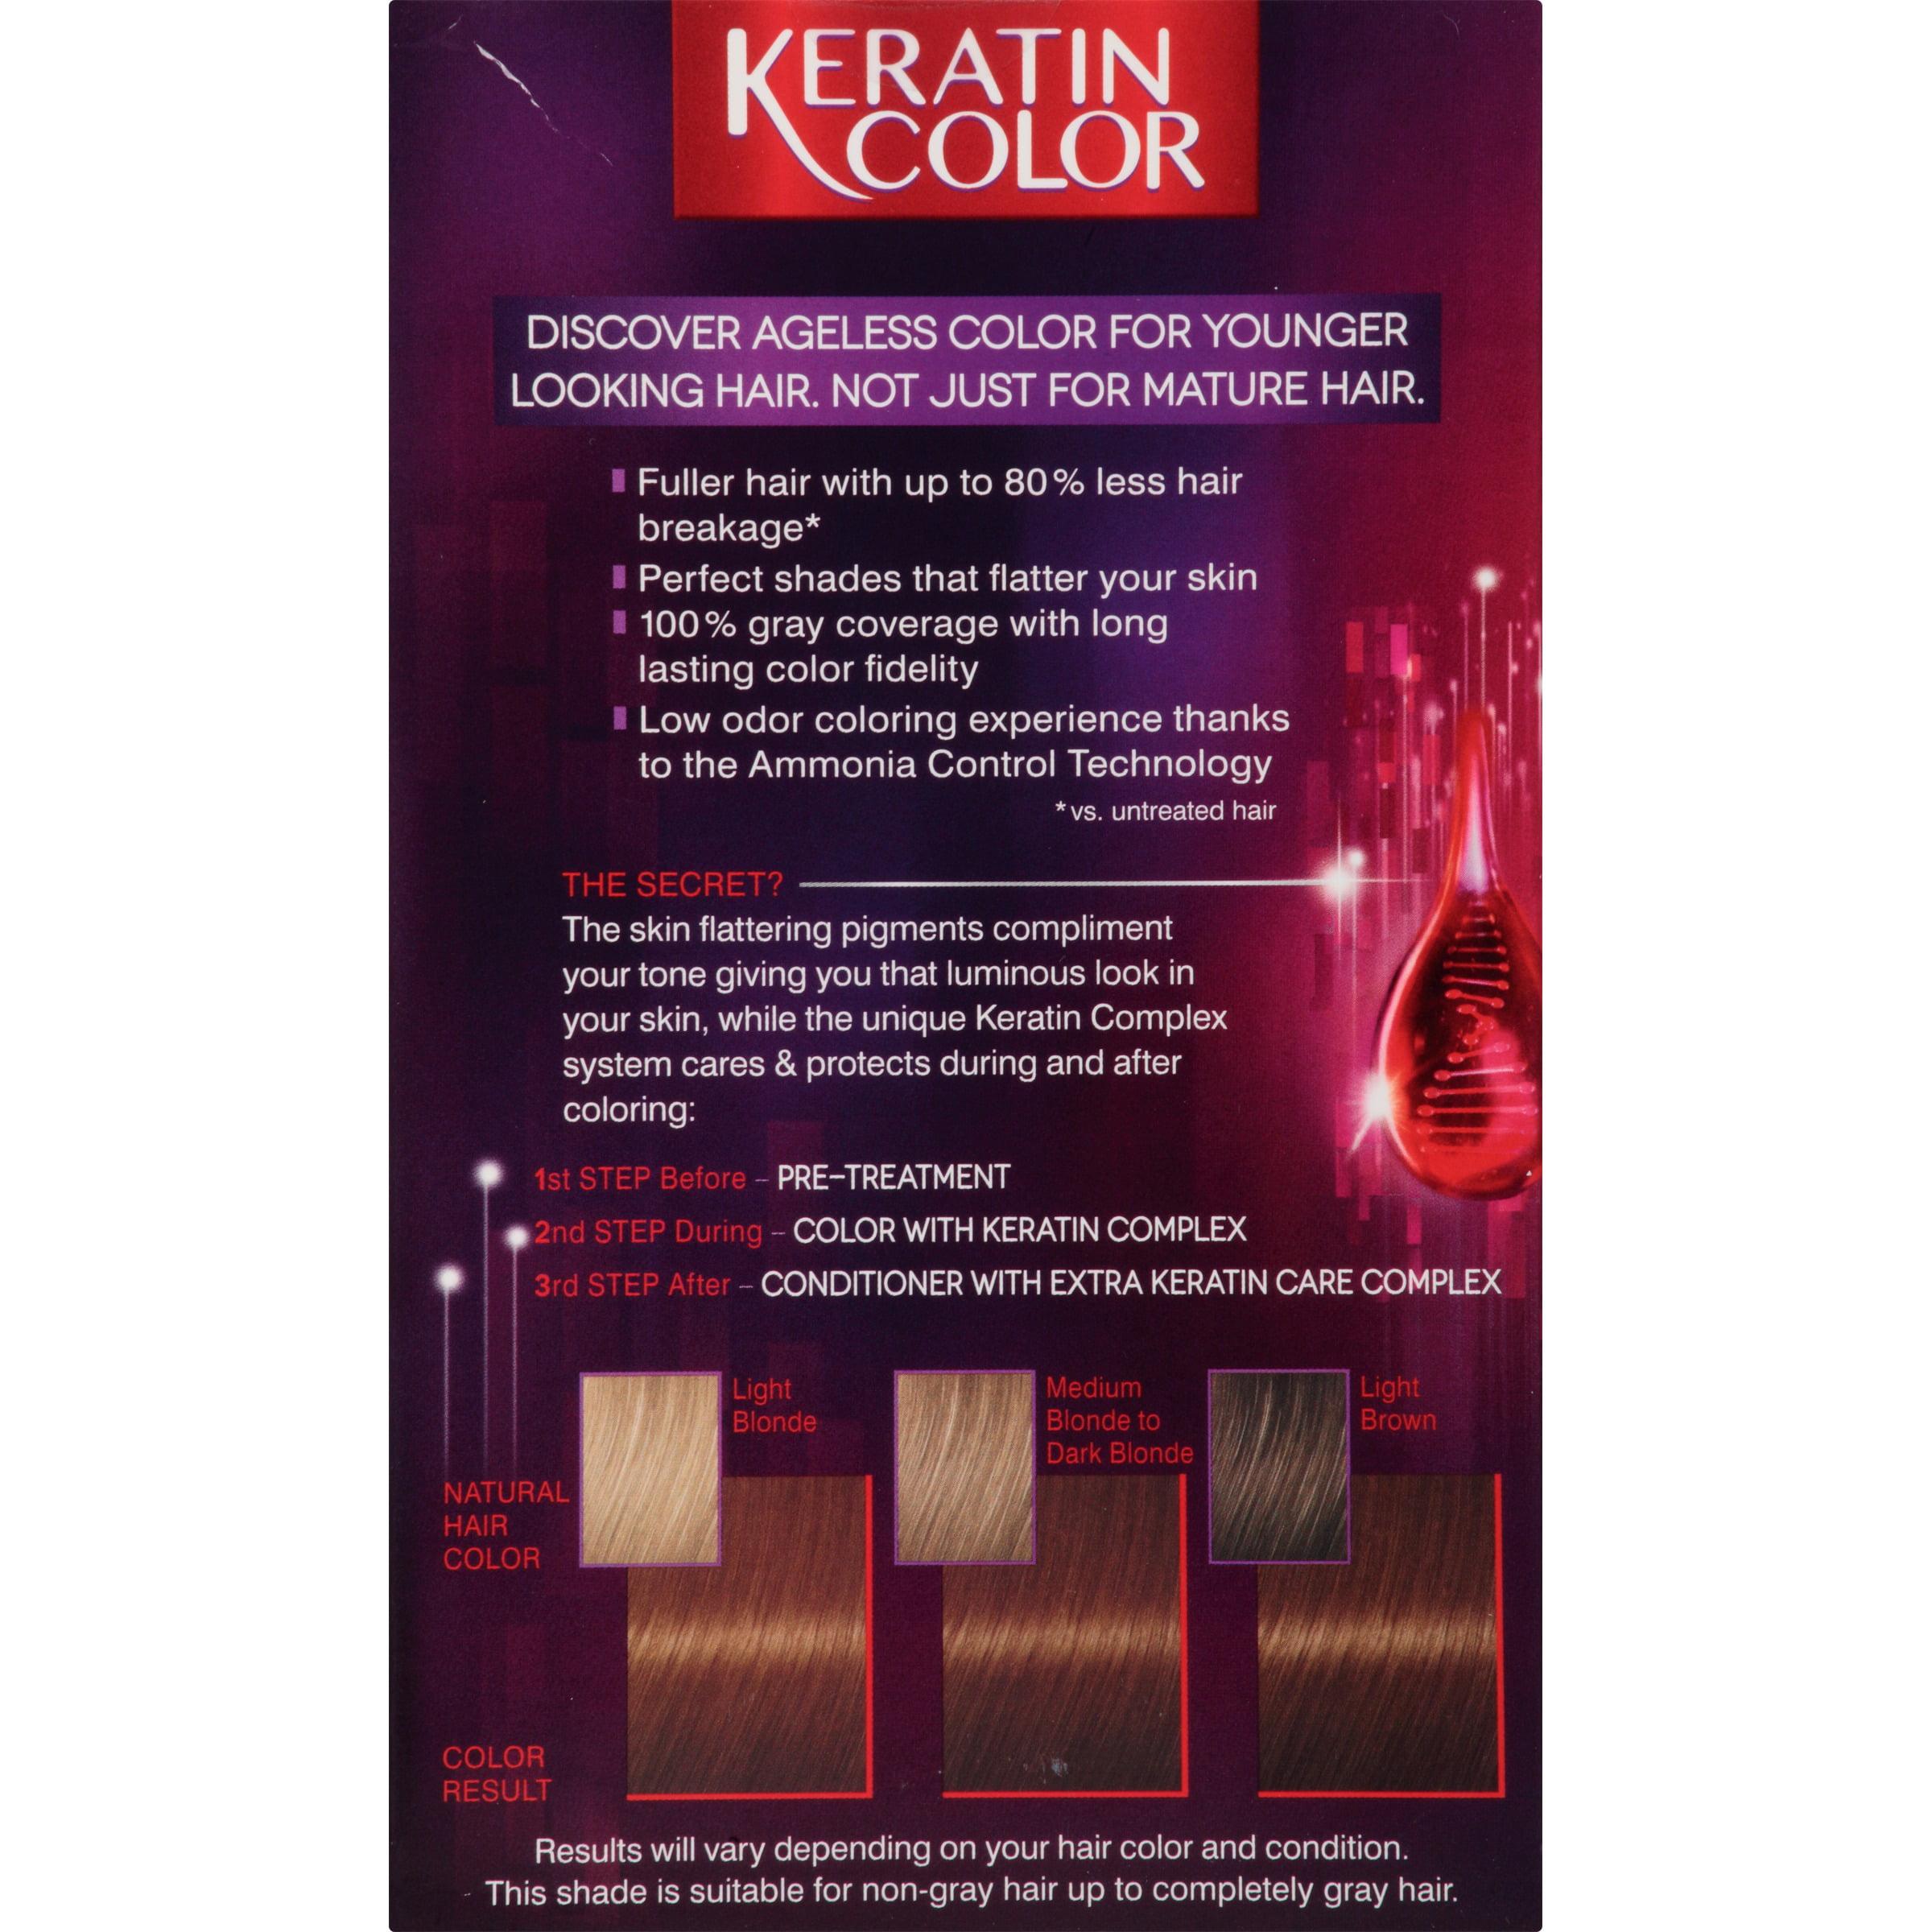 schwarzkopf keratin anti age hair color cashmere brown 5 5 2 03